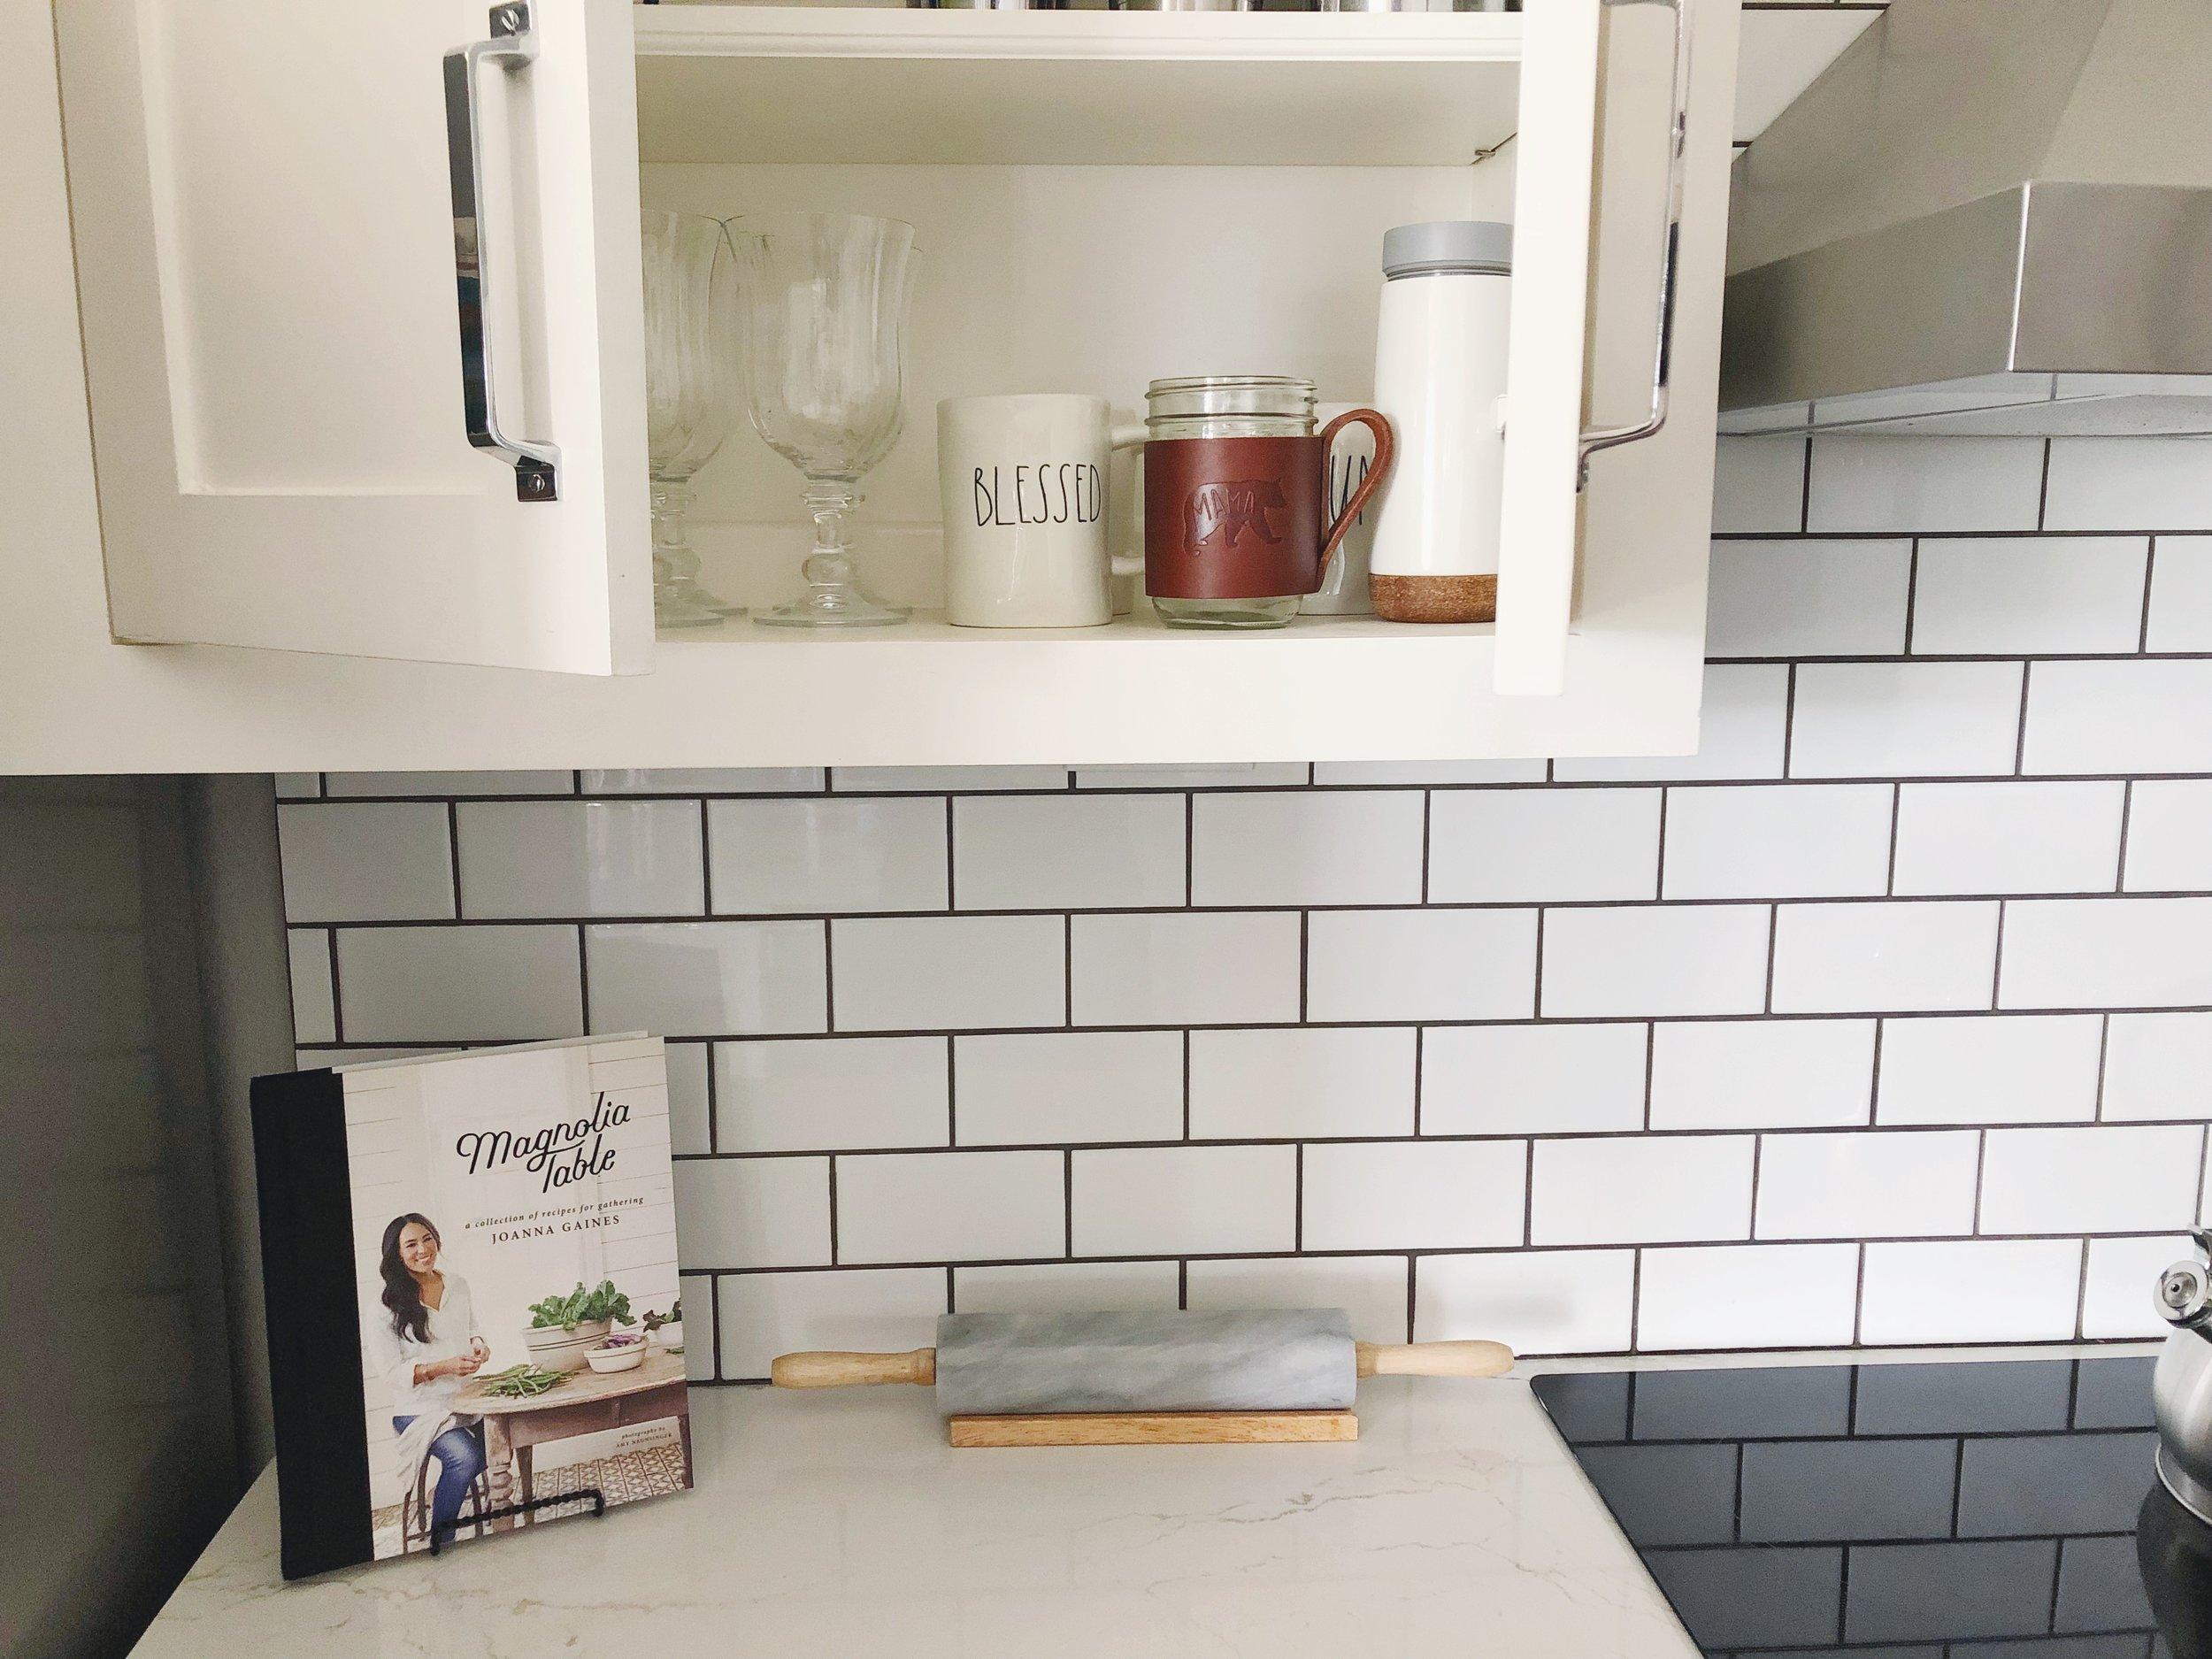 coffee-mugs-open-cabinets-white-kitchen